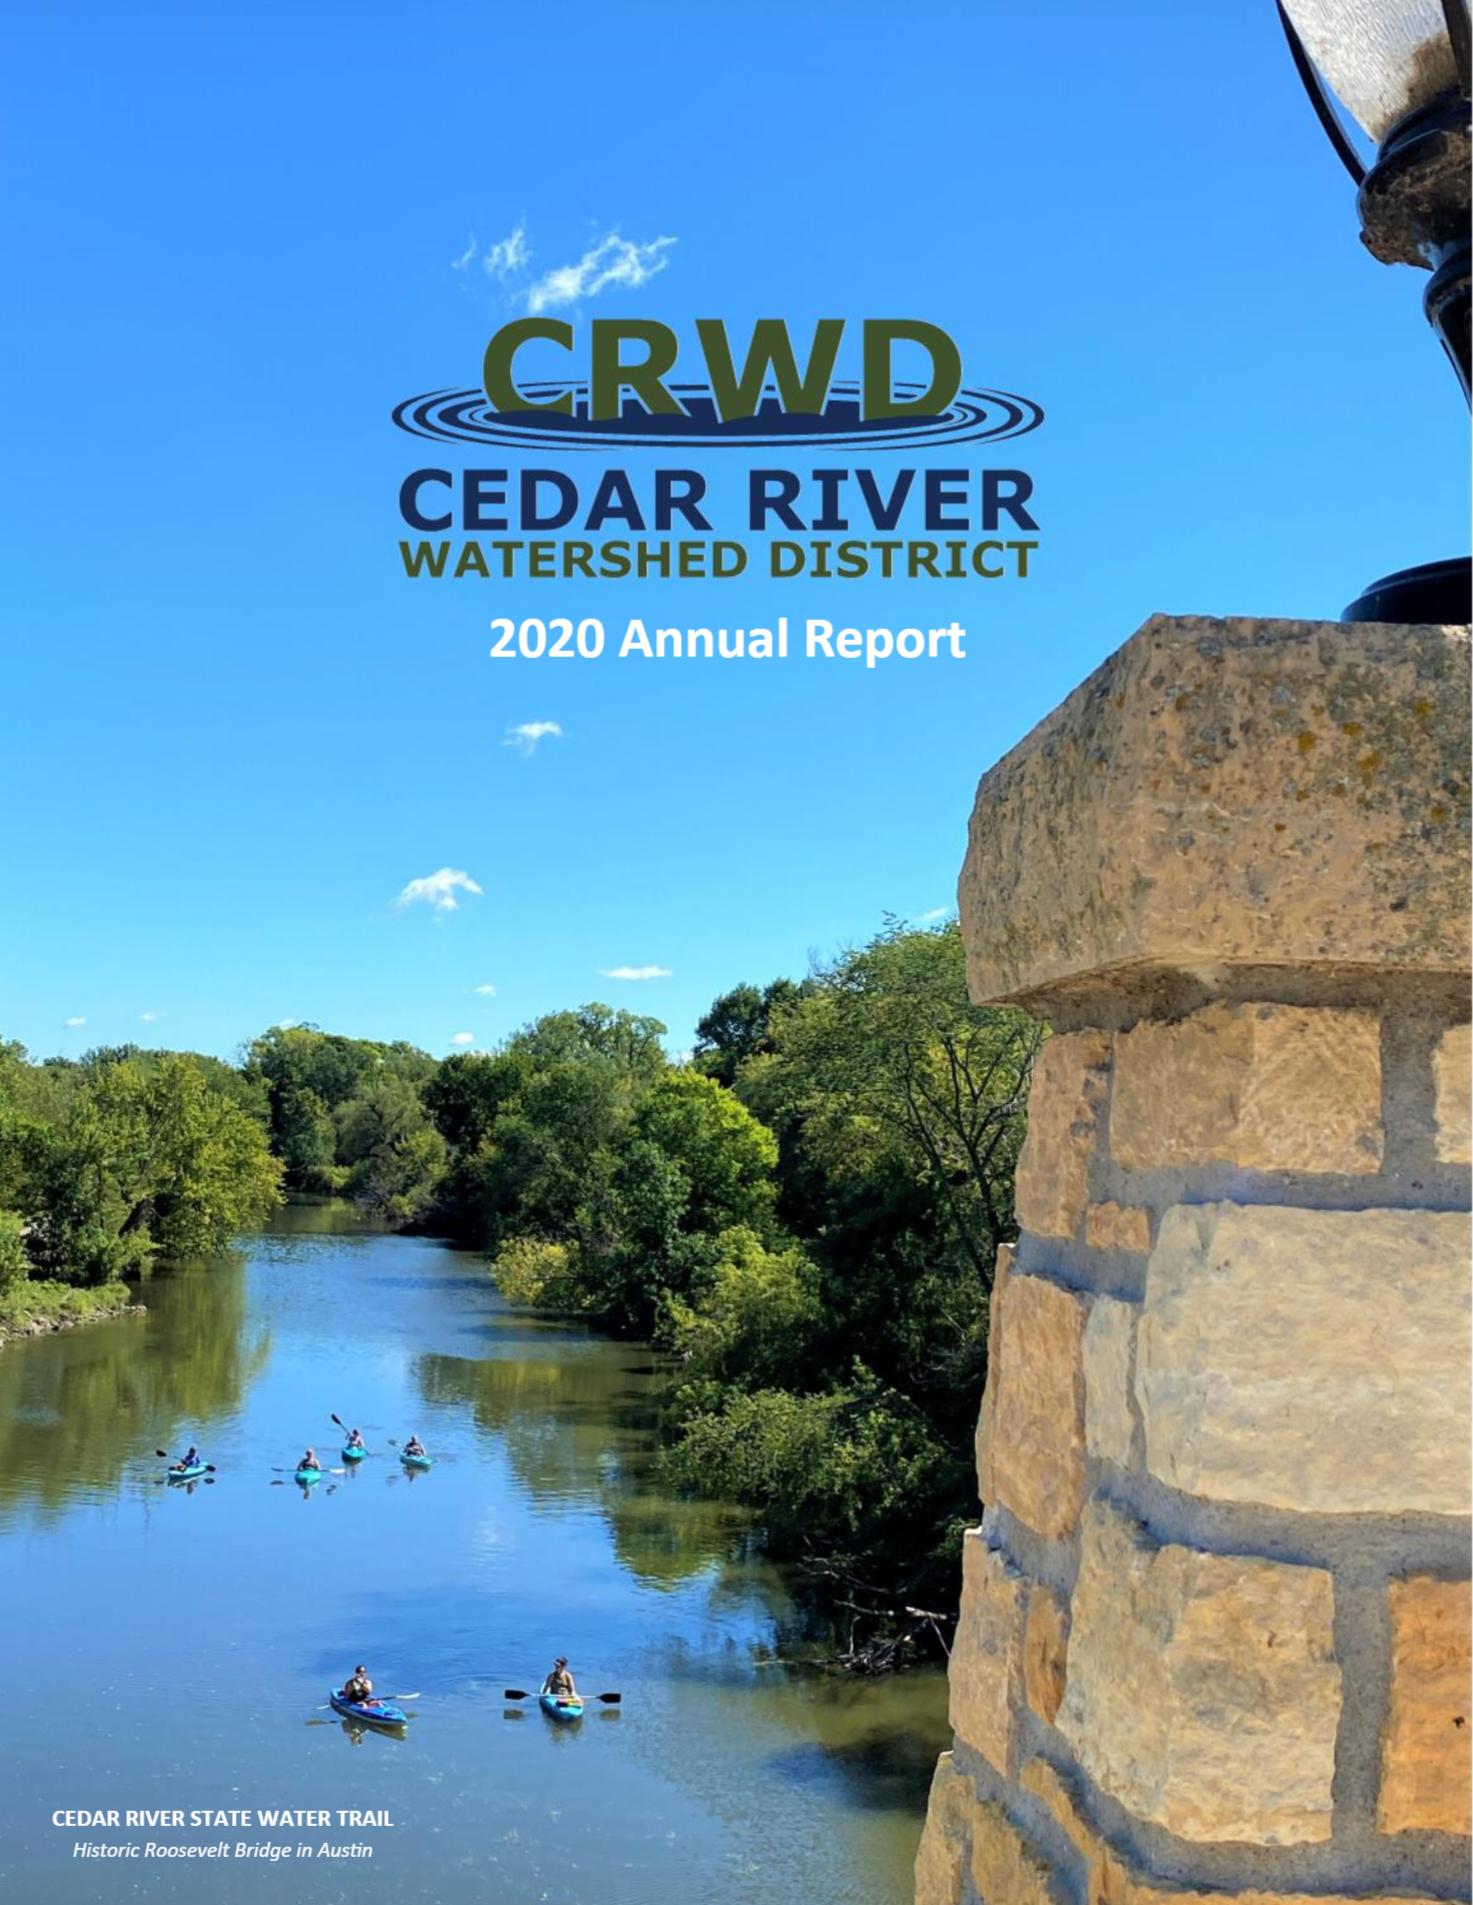 2020 crwd annual report COVER